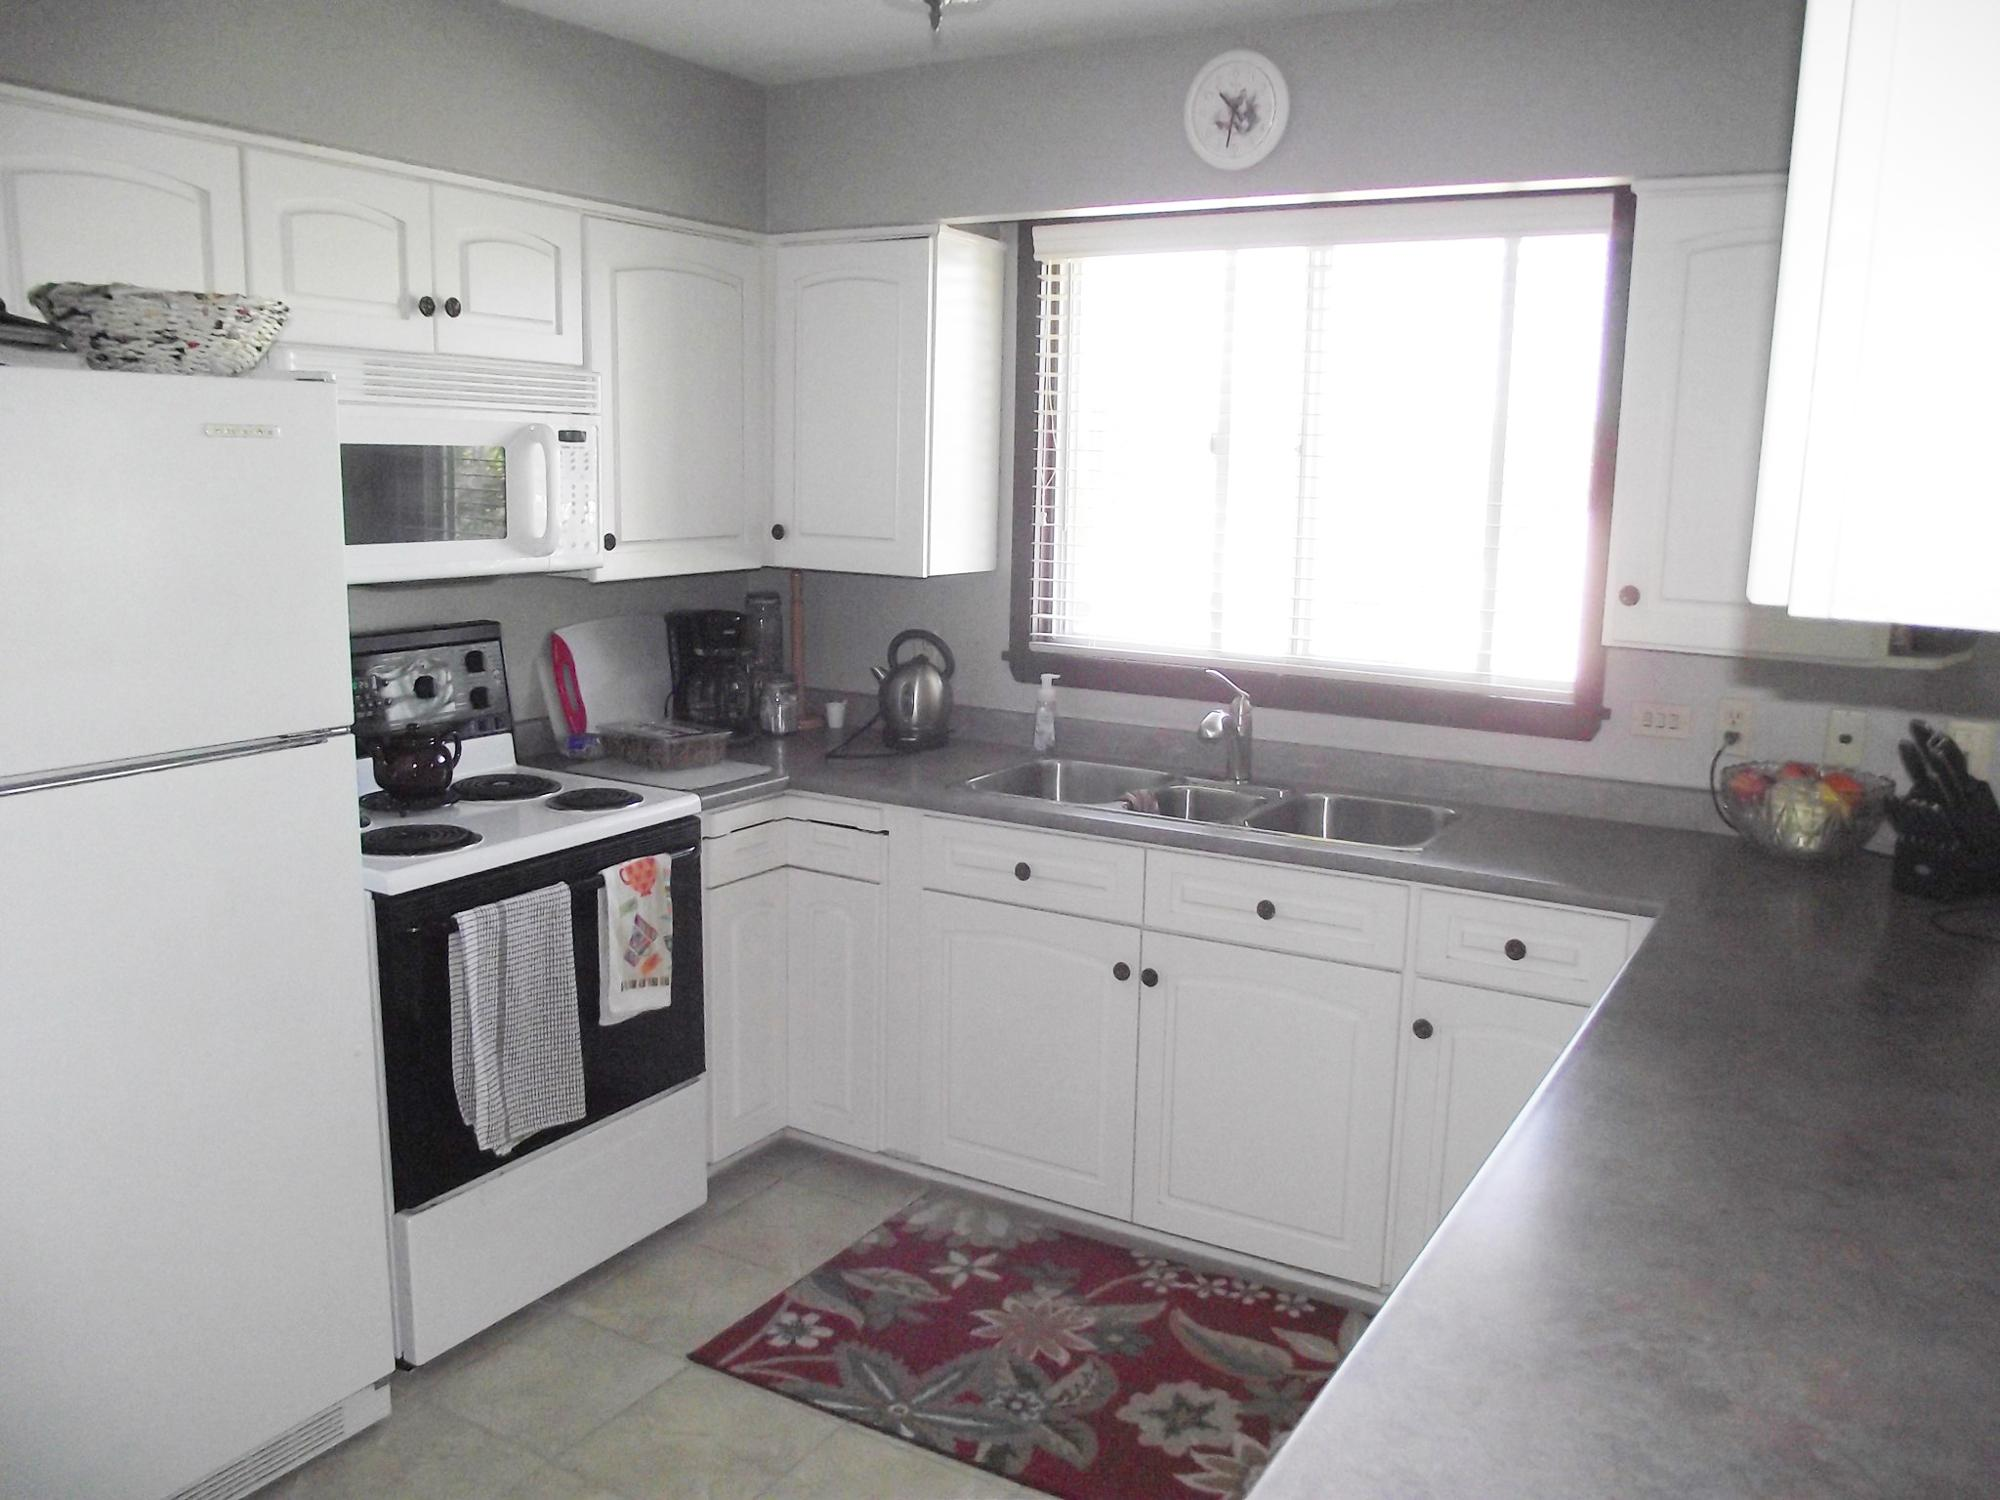 Kitchen set stainless steel outdoor kitchen cabinets with sink